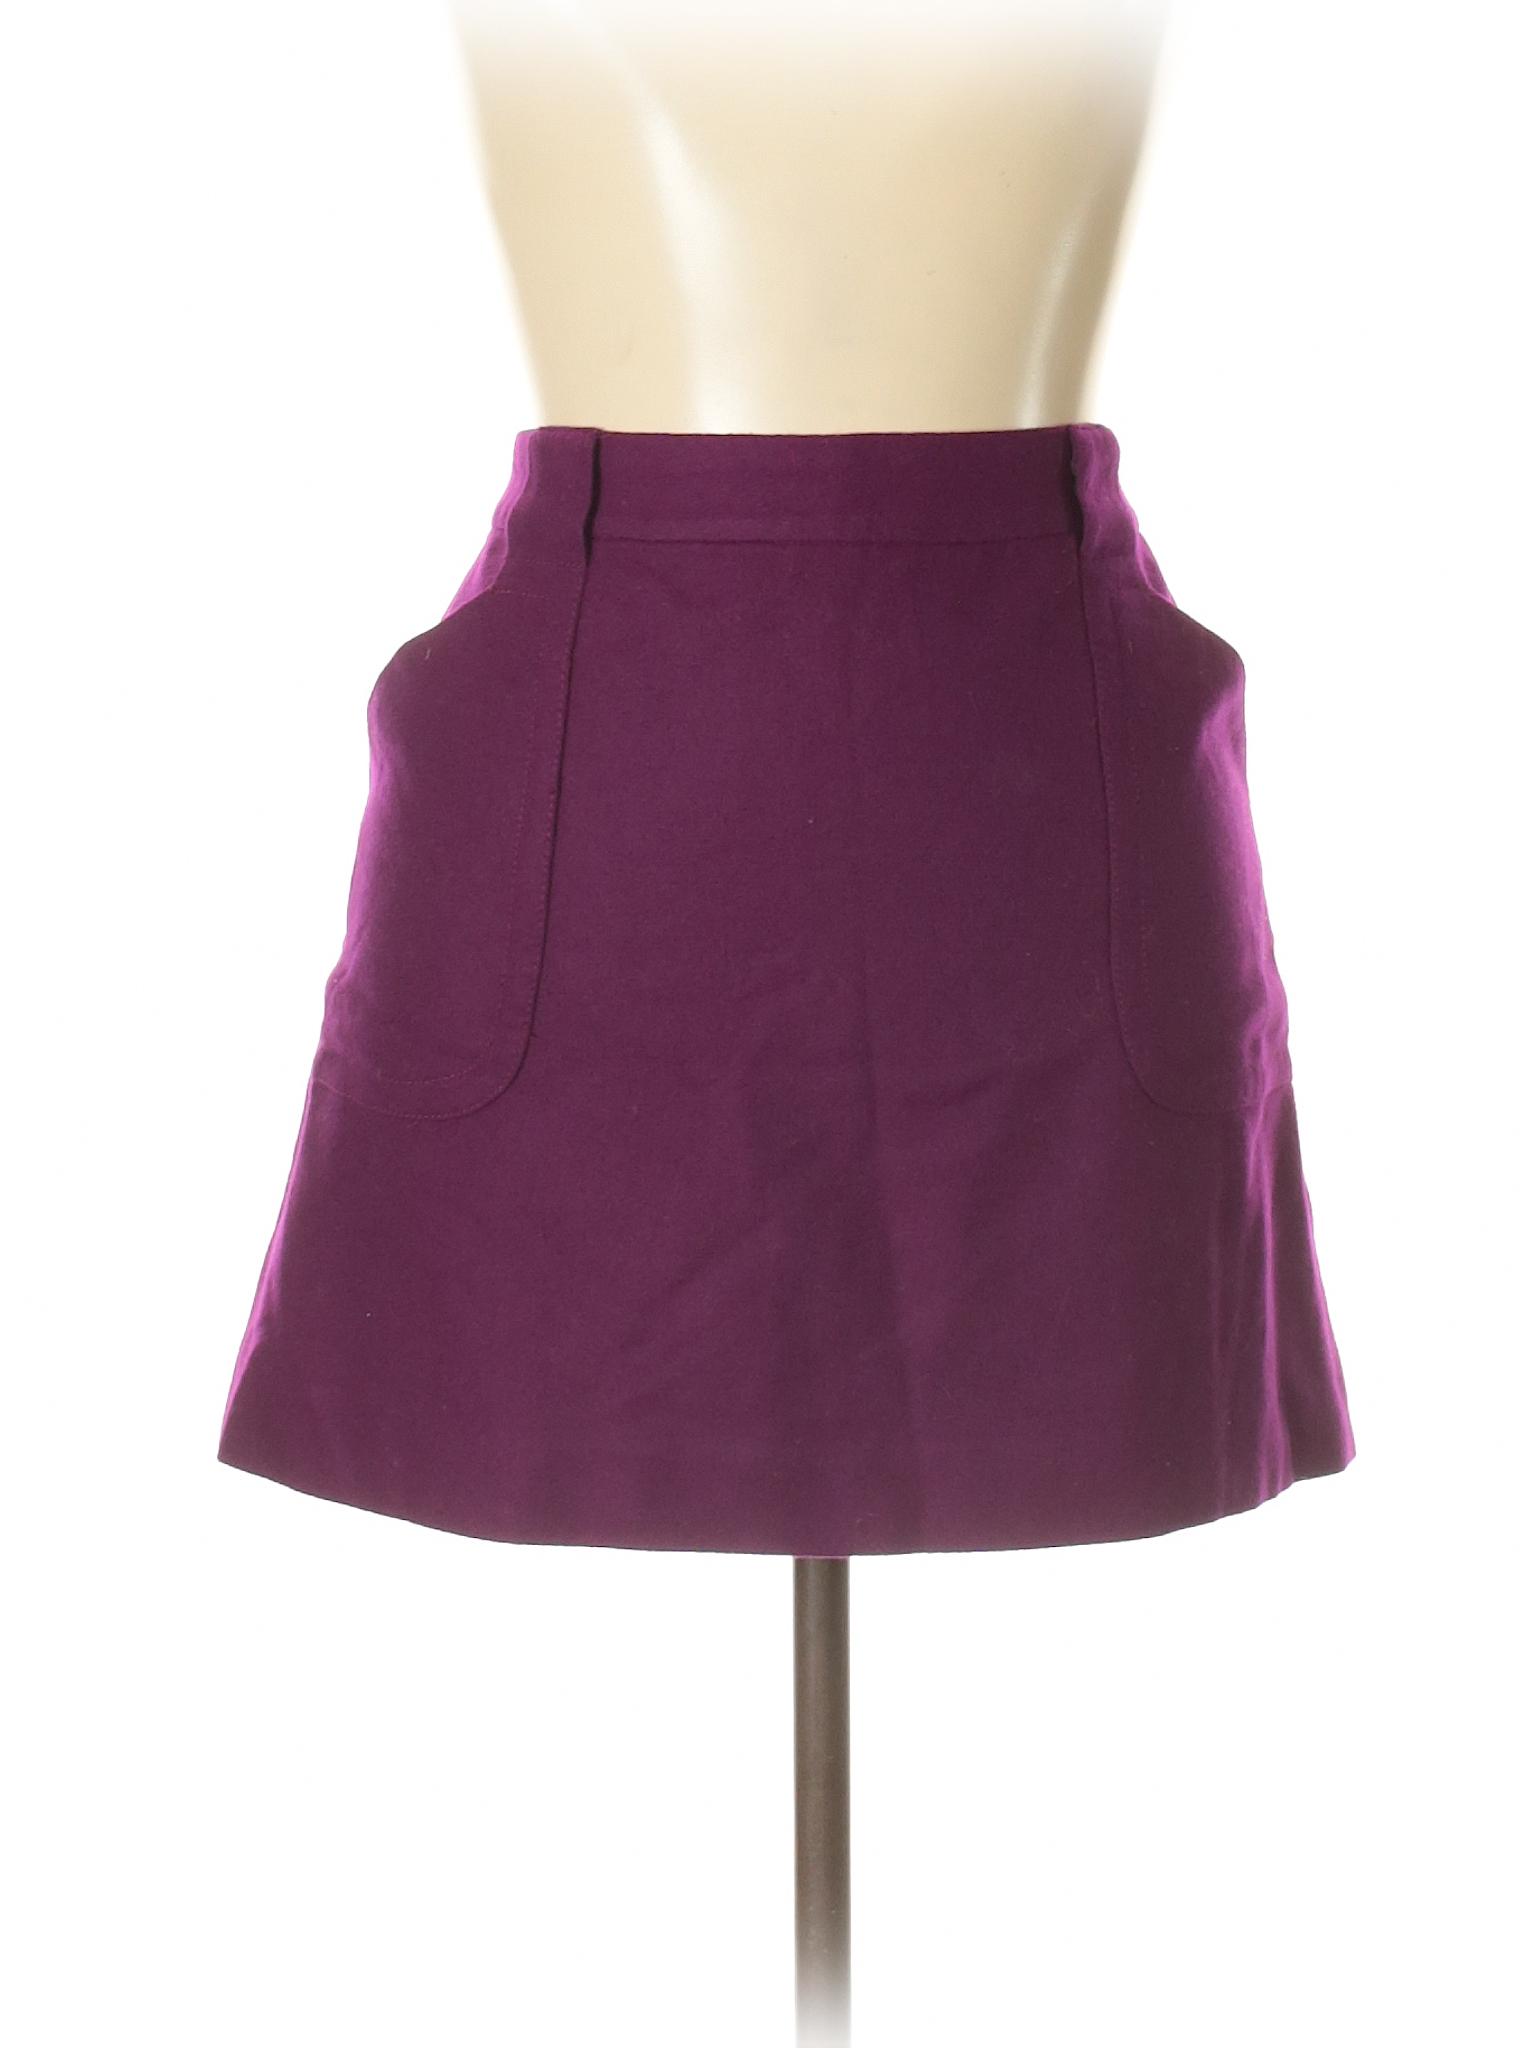 Skirt Boutique Wool Boutique Boutique Skirt Wool Skirt Wool Boutique Wool Skirt SBxIwRn